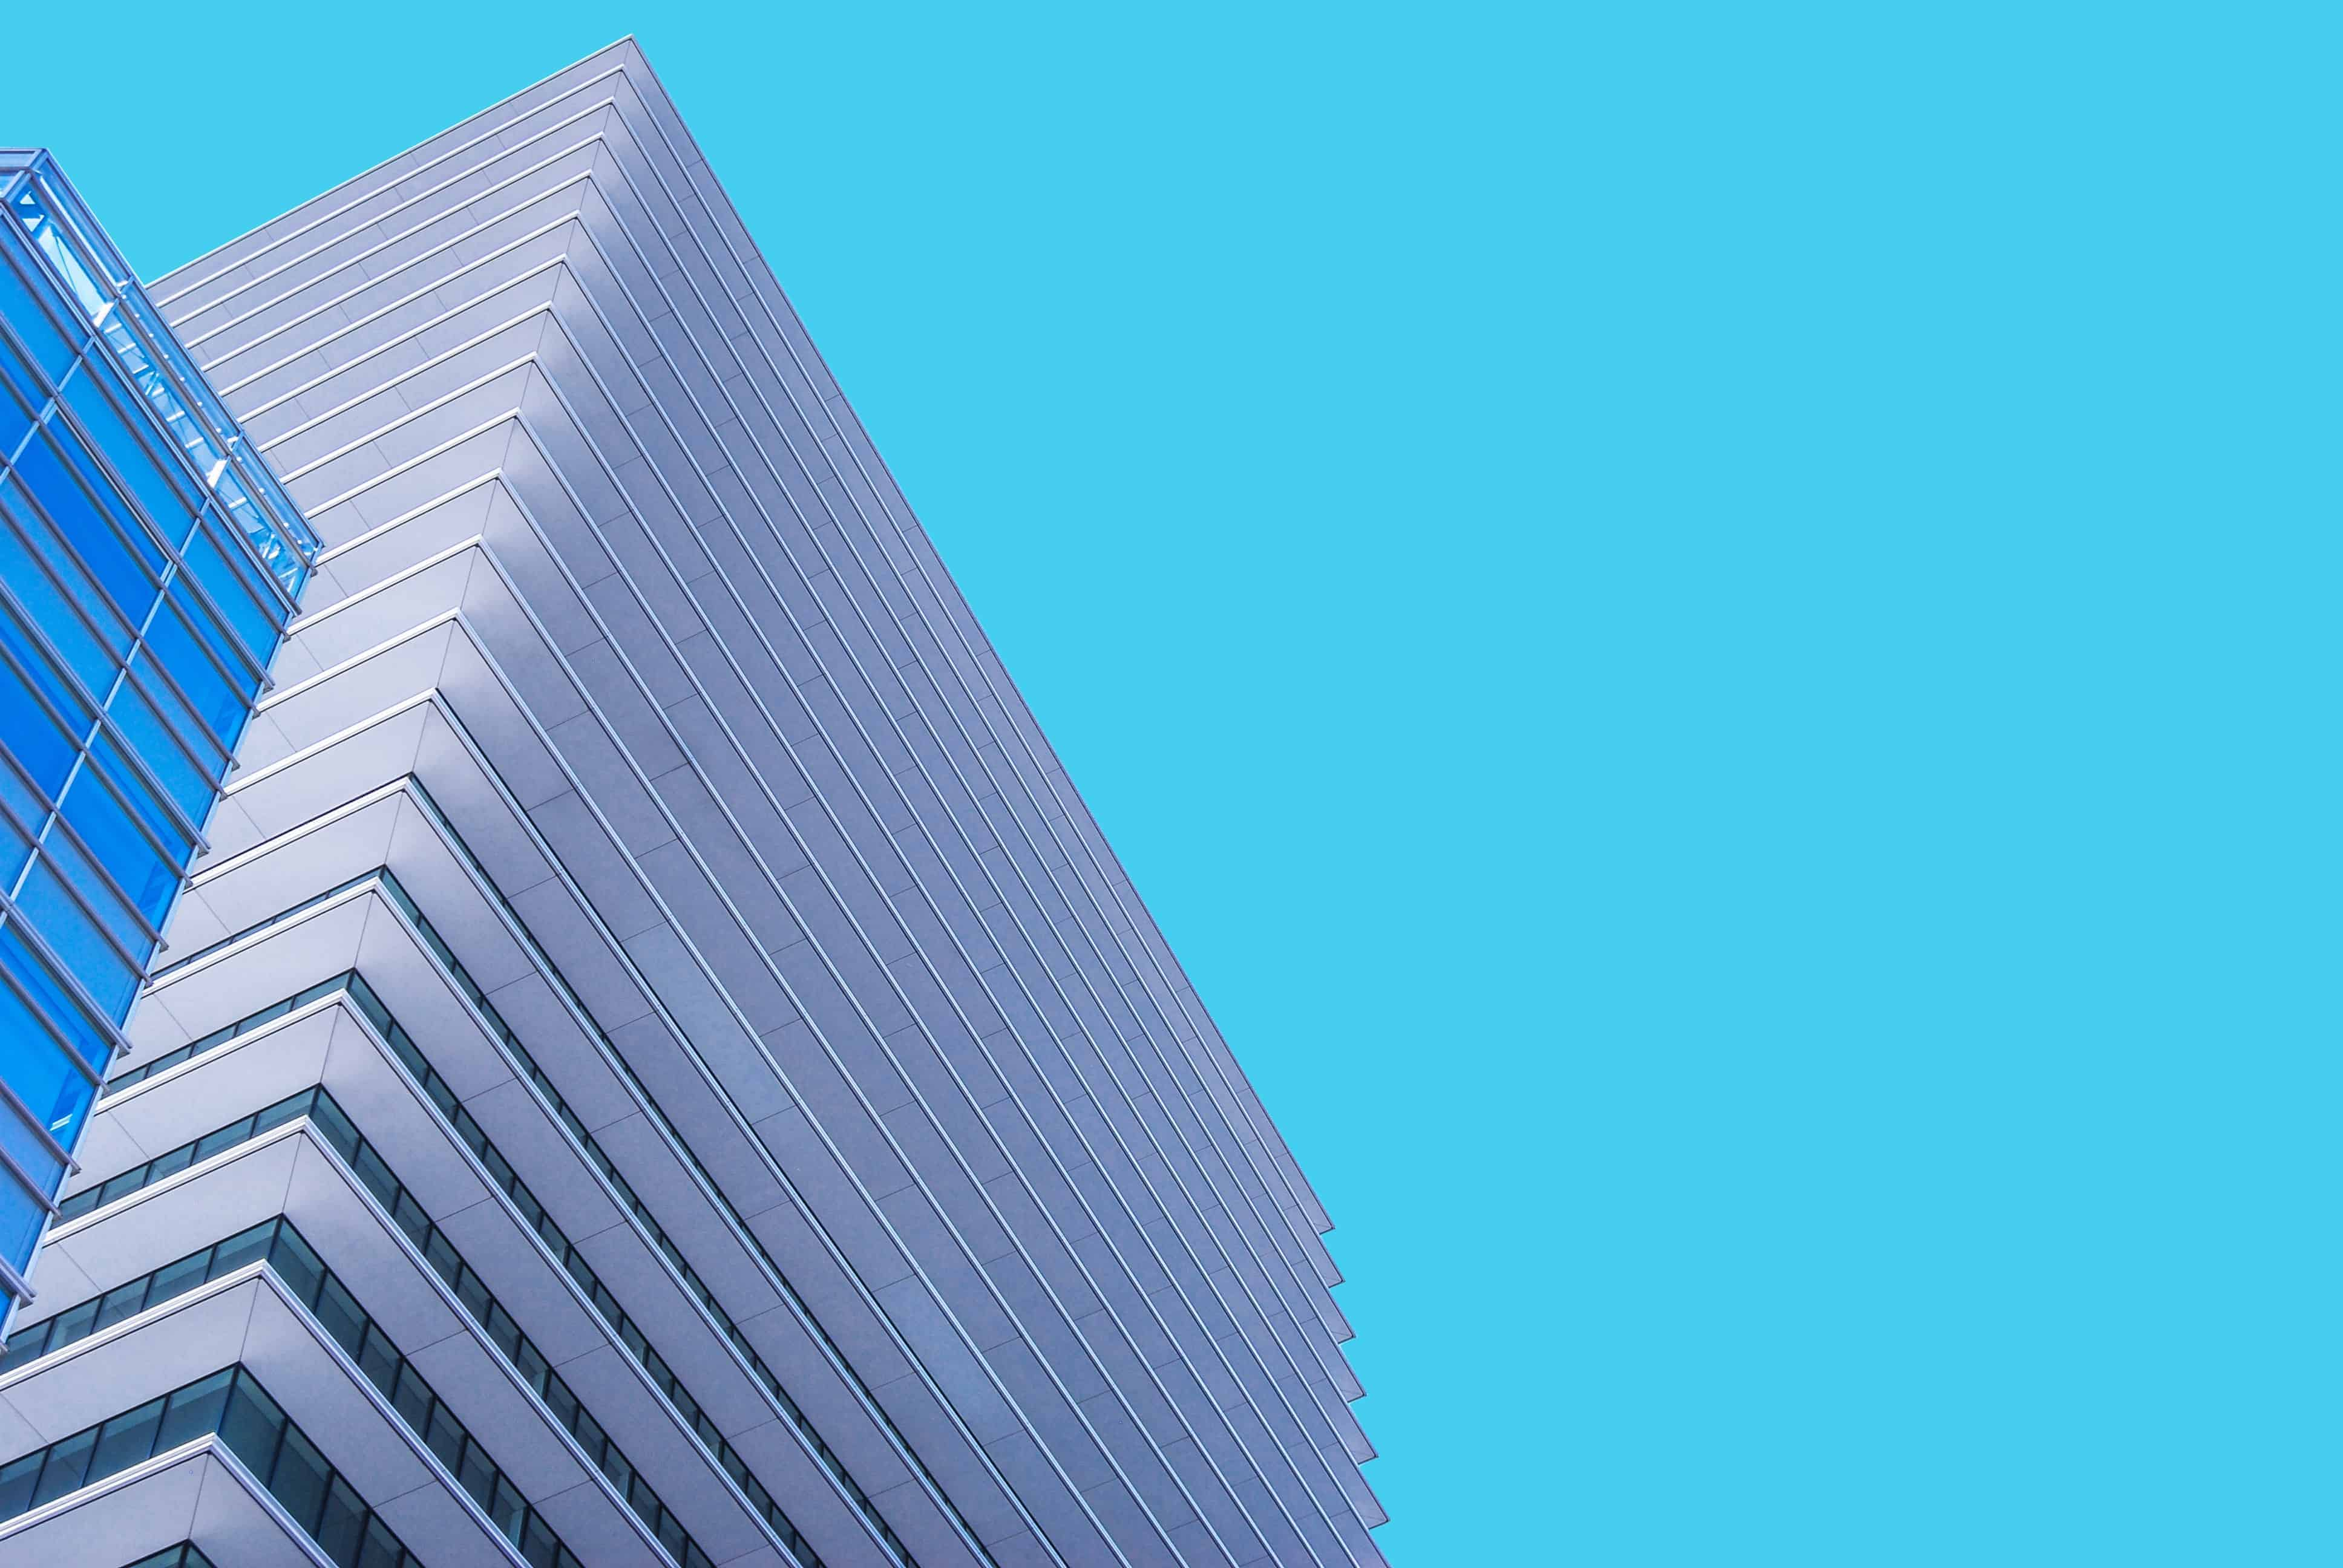 leadgenerierung immobilienbranche